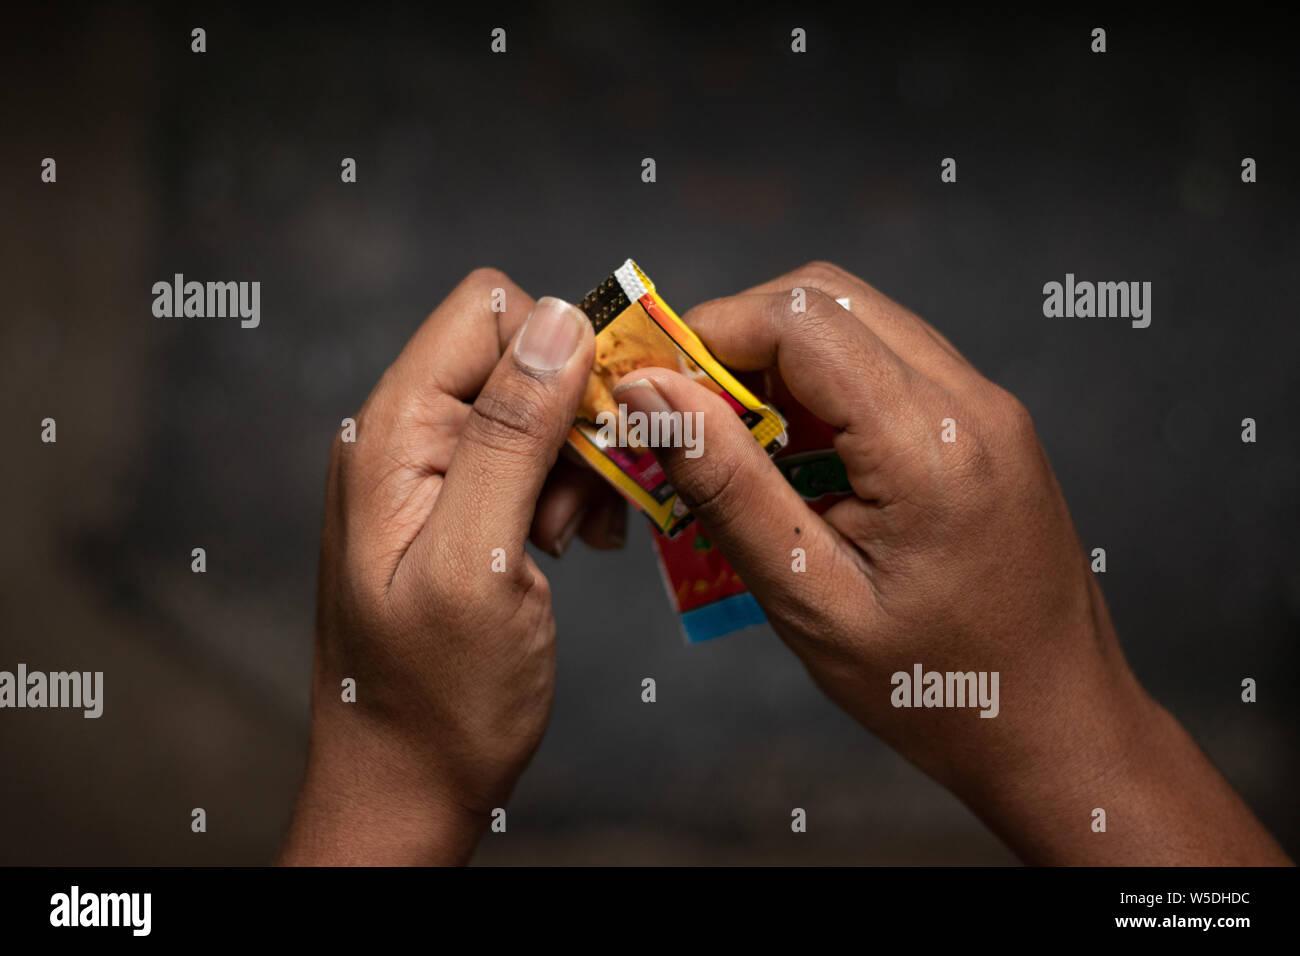 Gutka Stock Photos & Gutka Stock Images - Alamy